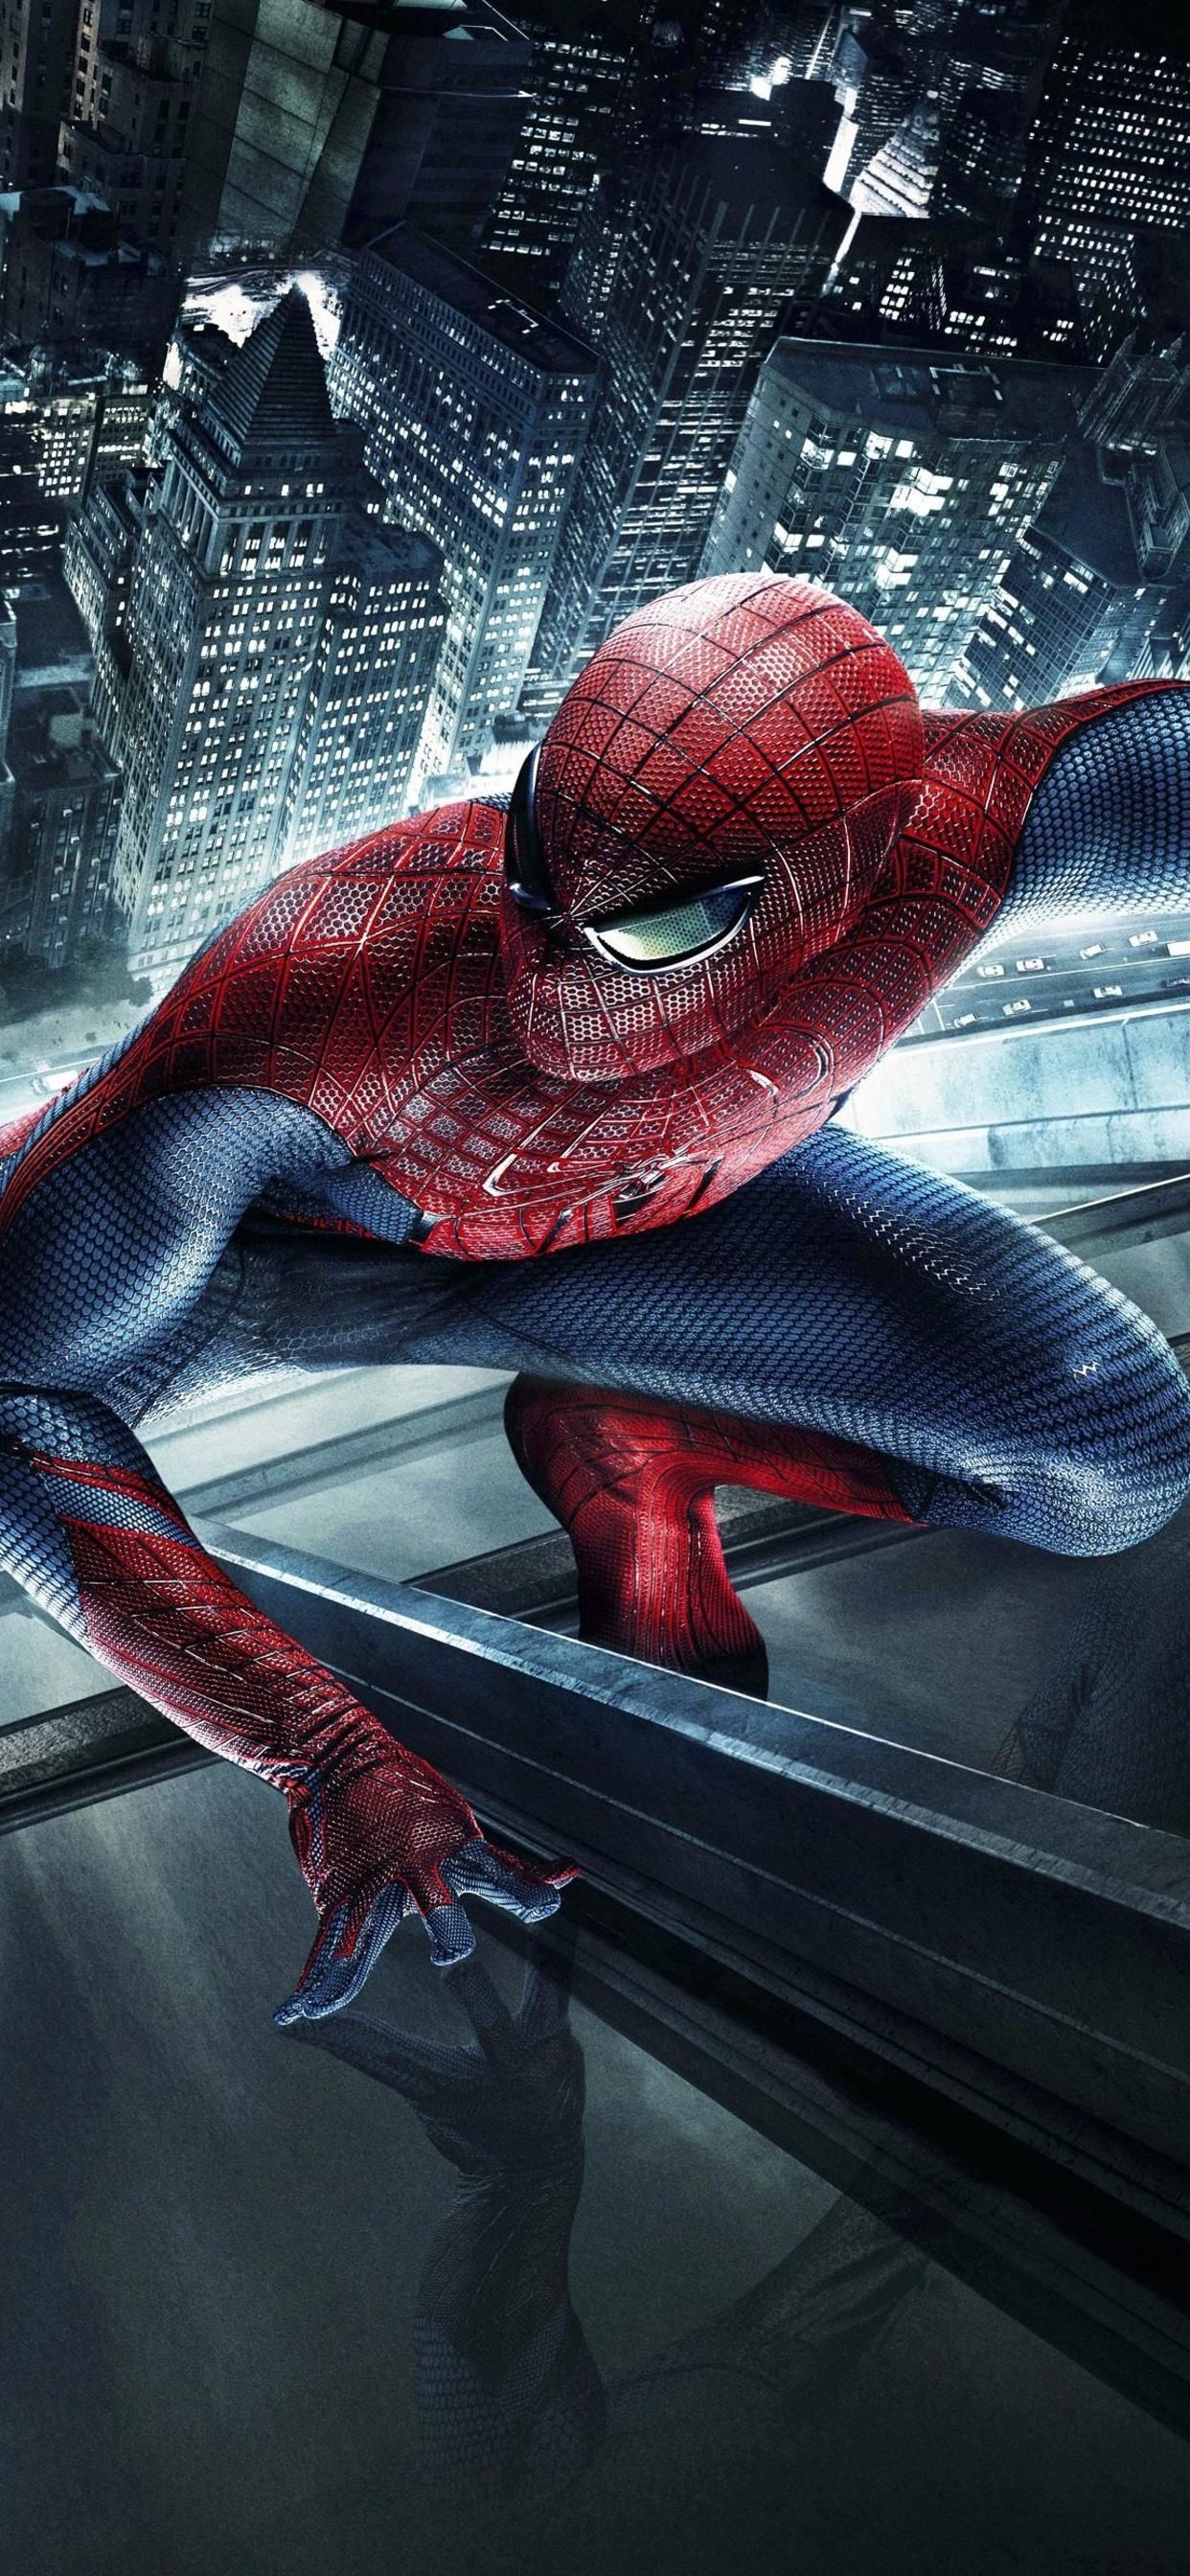 spiderman-4k-ix.jpg